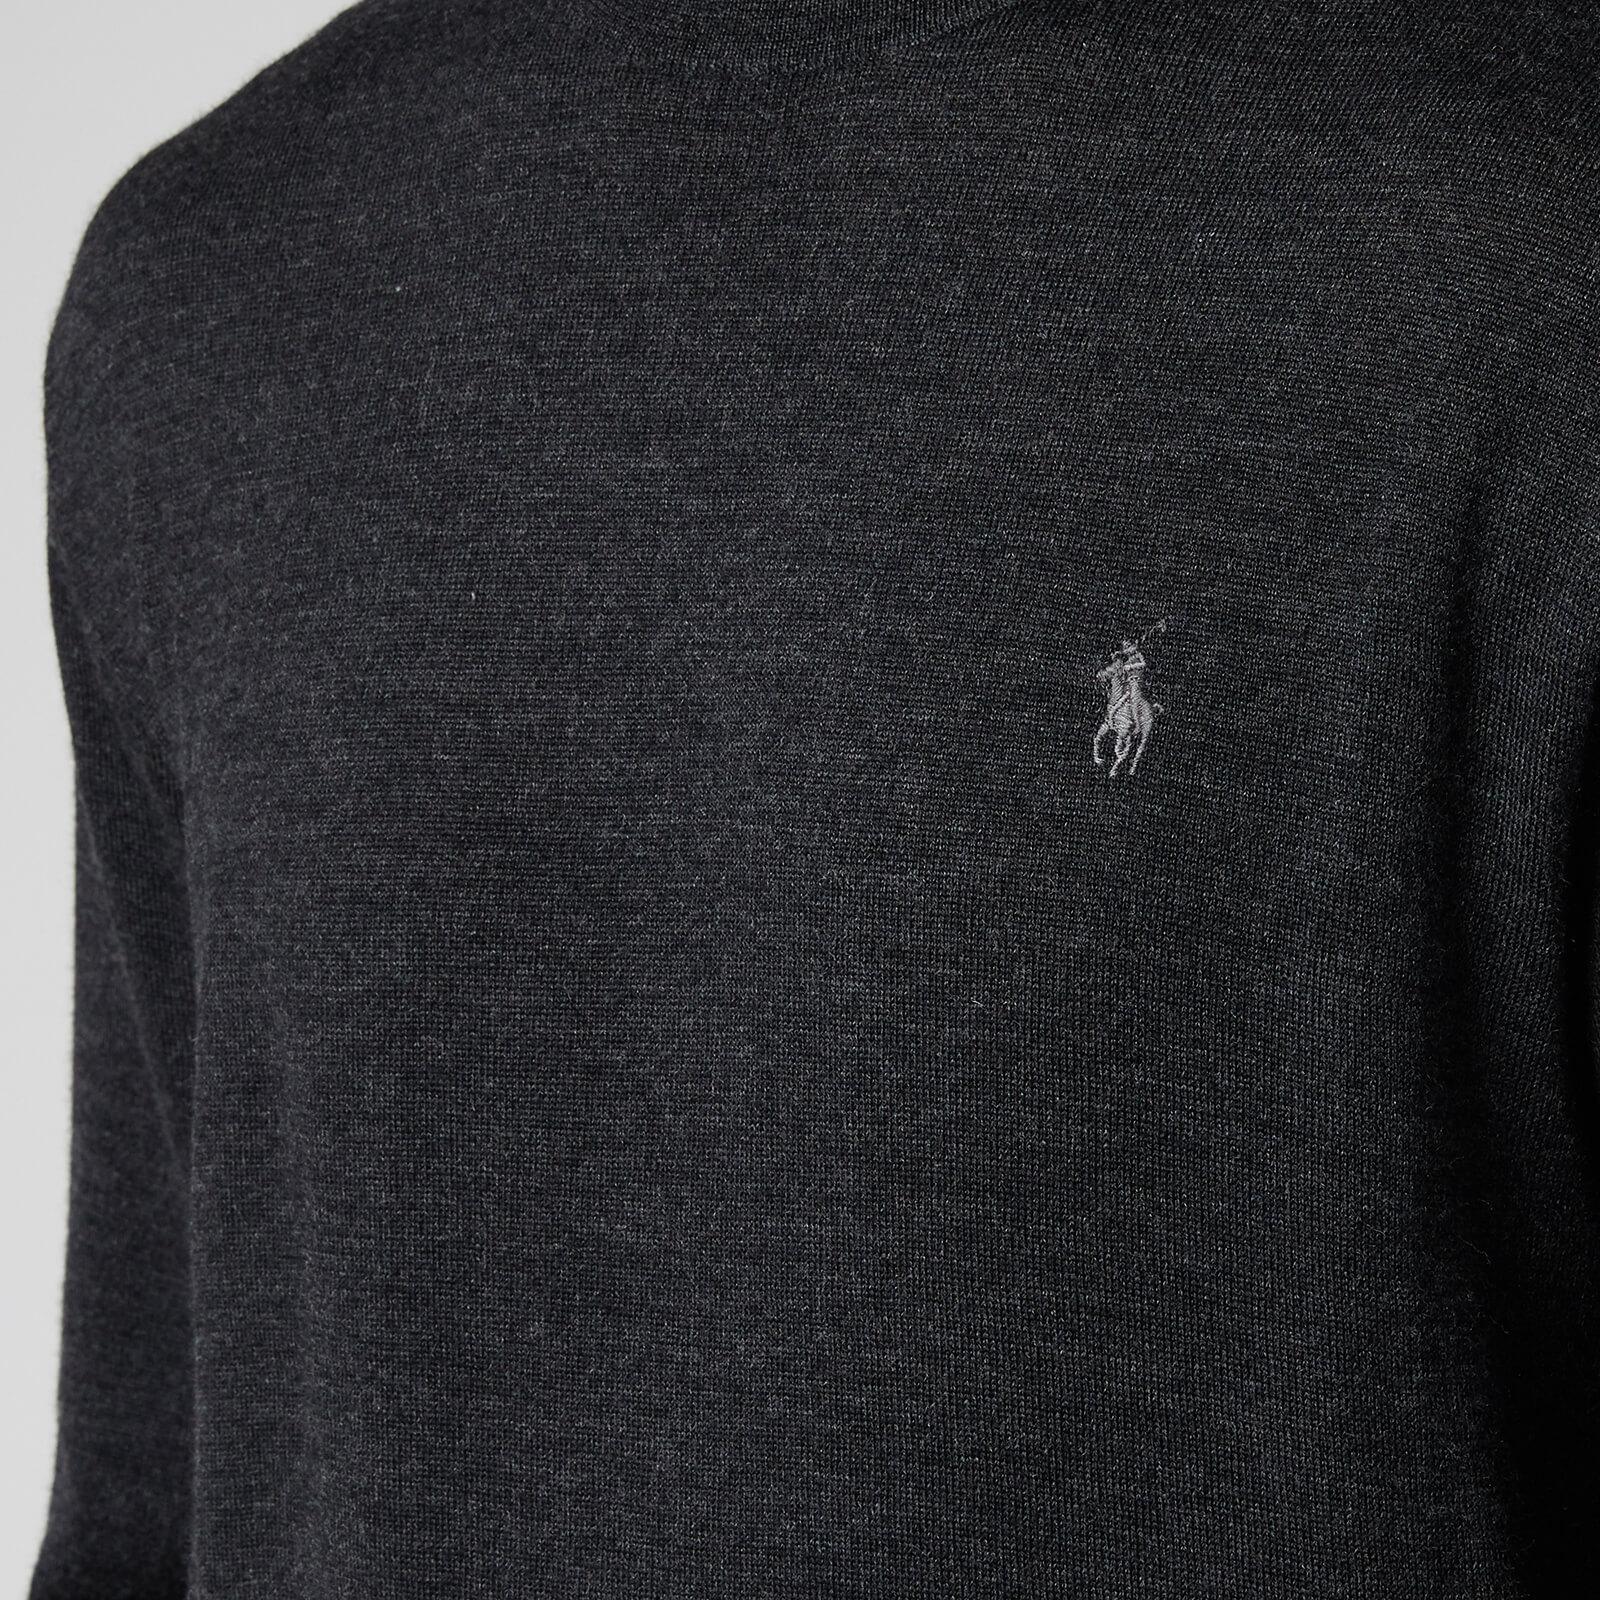 Polo Ralph Lauren Men's Merino Wool Turtleneck Jumper - Dark Granite Heather - Xl 710771090004 Mens Clothing, Grey